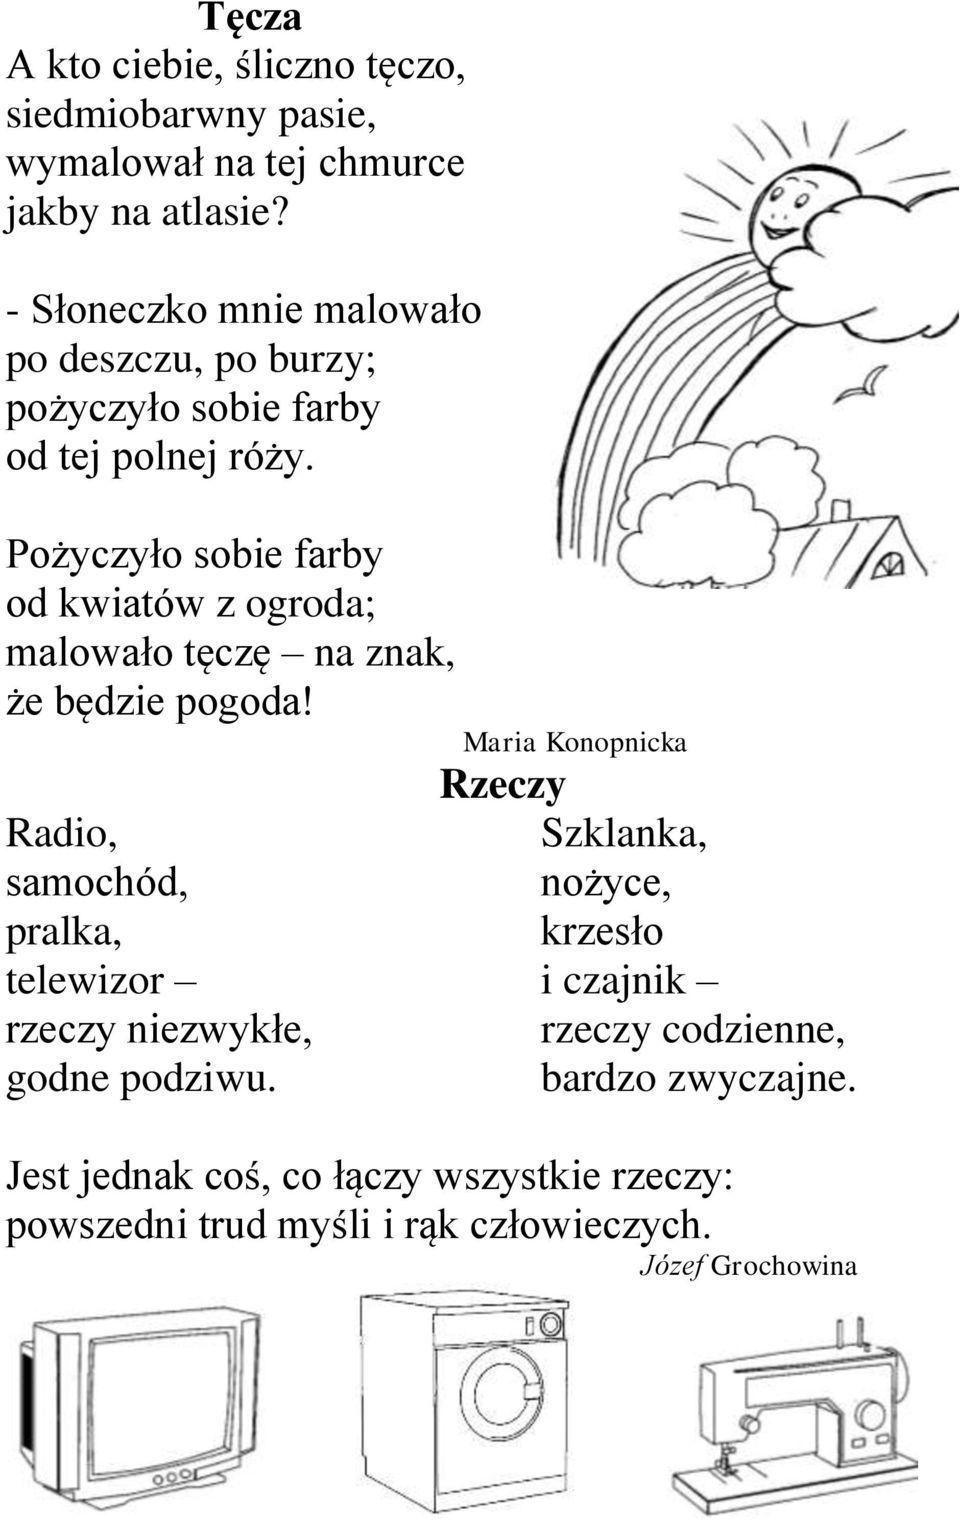 Pin By Malgorzata Smykala On Kindergarten Kindergarten Education Words